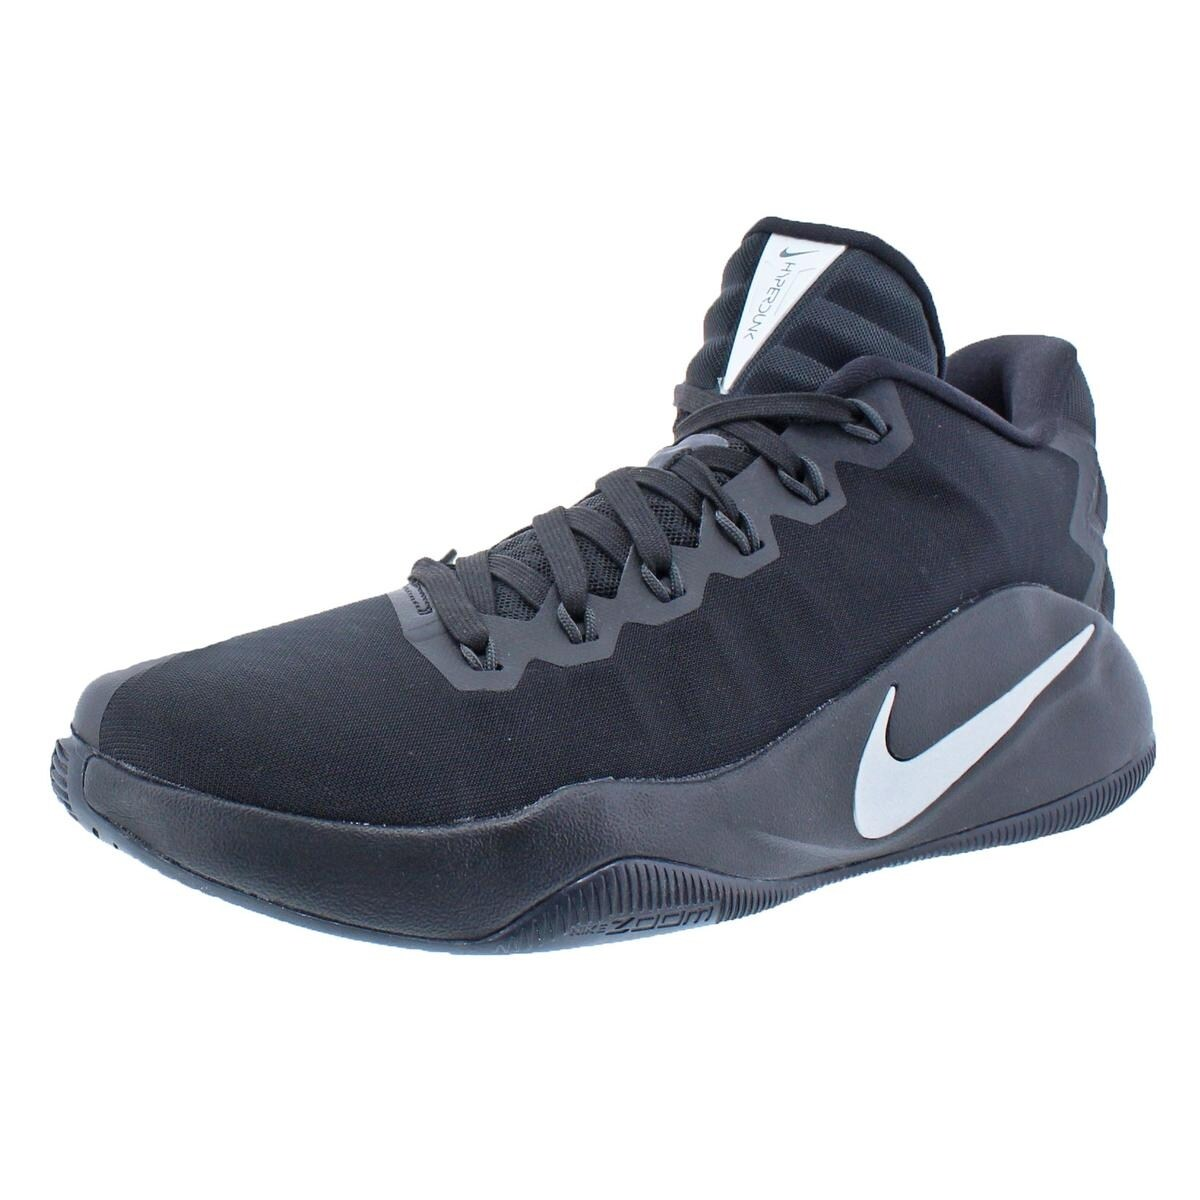 wholesale dealer bdb3b 0d6bb Nike Mens Hyperdunk 2016 Low Basketball Shoes Athletic Low-Top - 9 medium  (d)